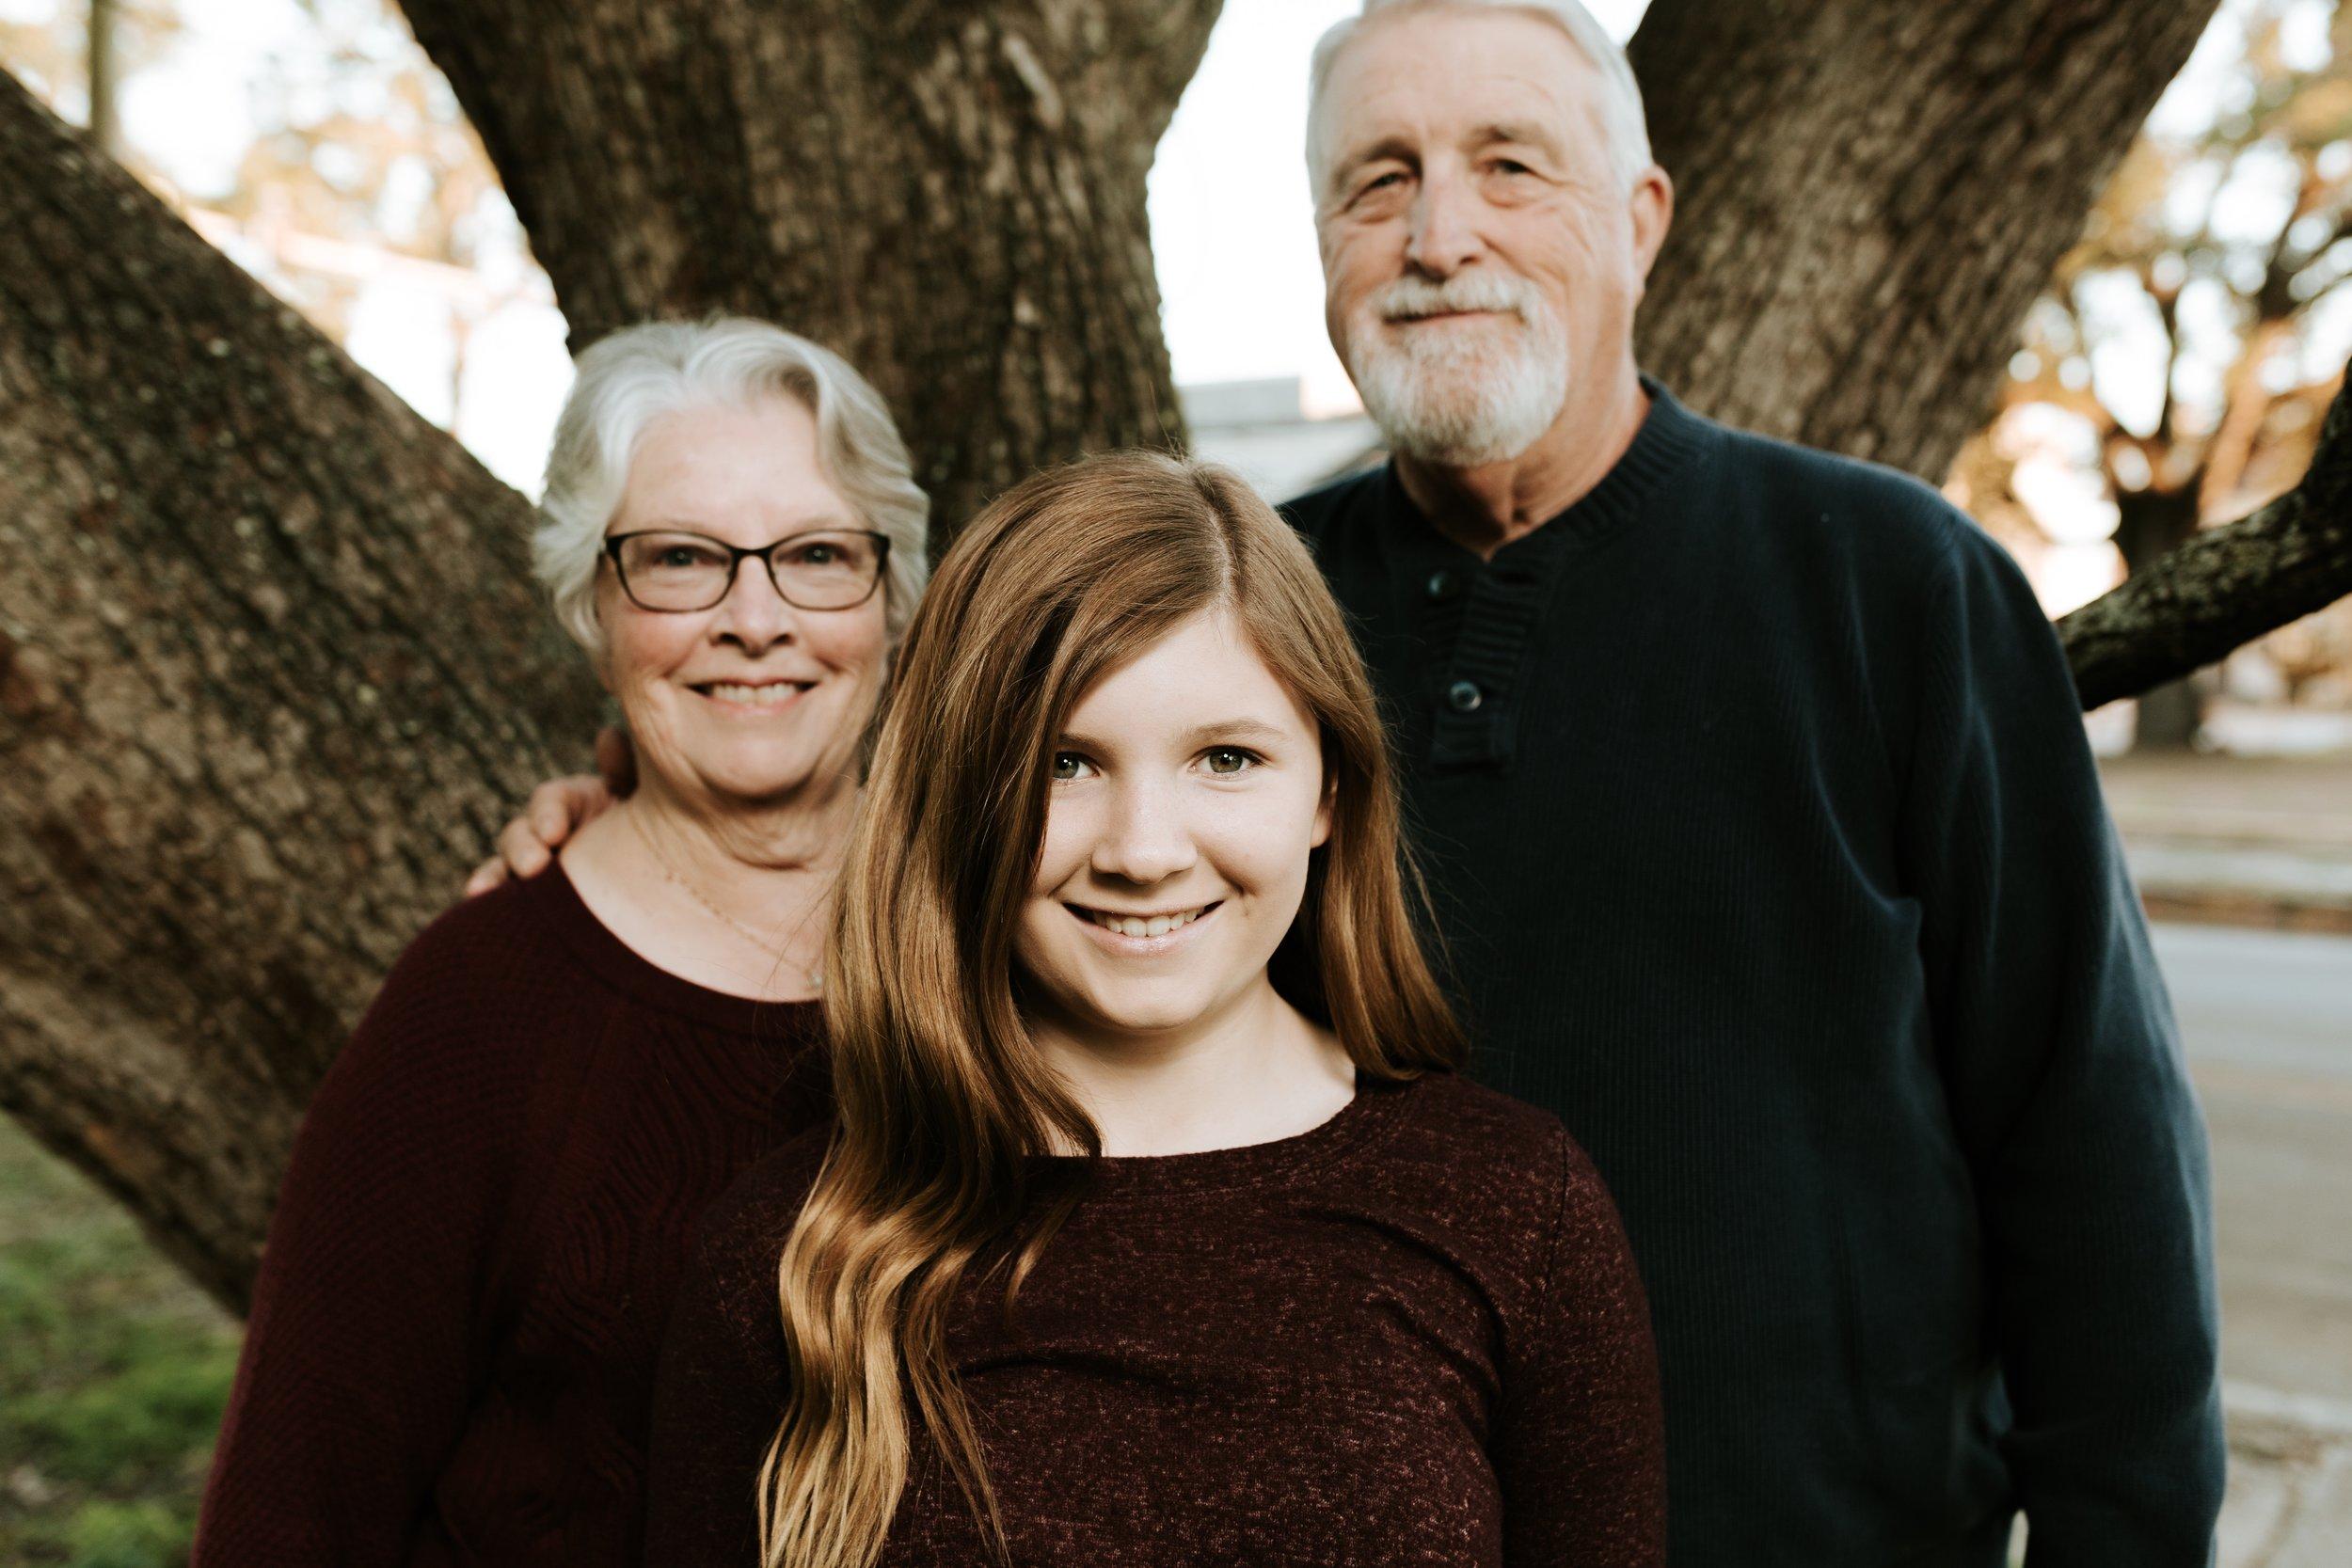 lake-charles-baton-rouge-family-photography